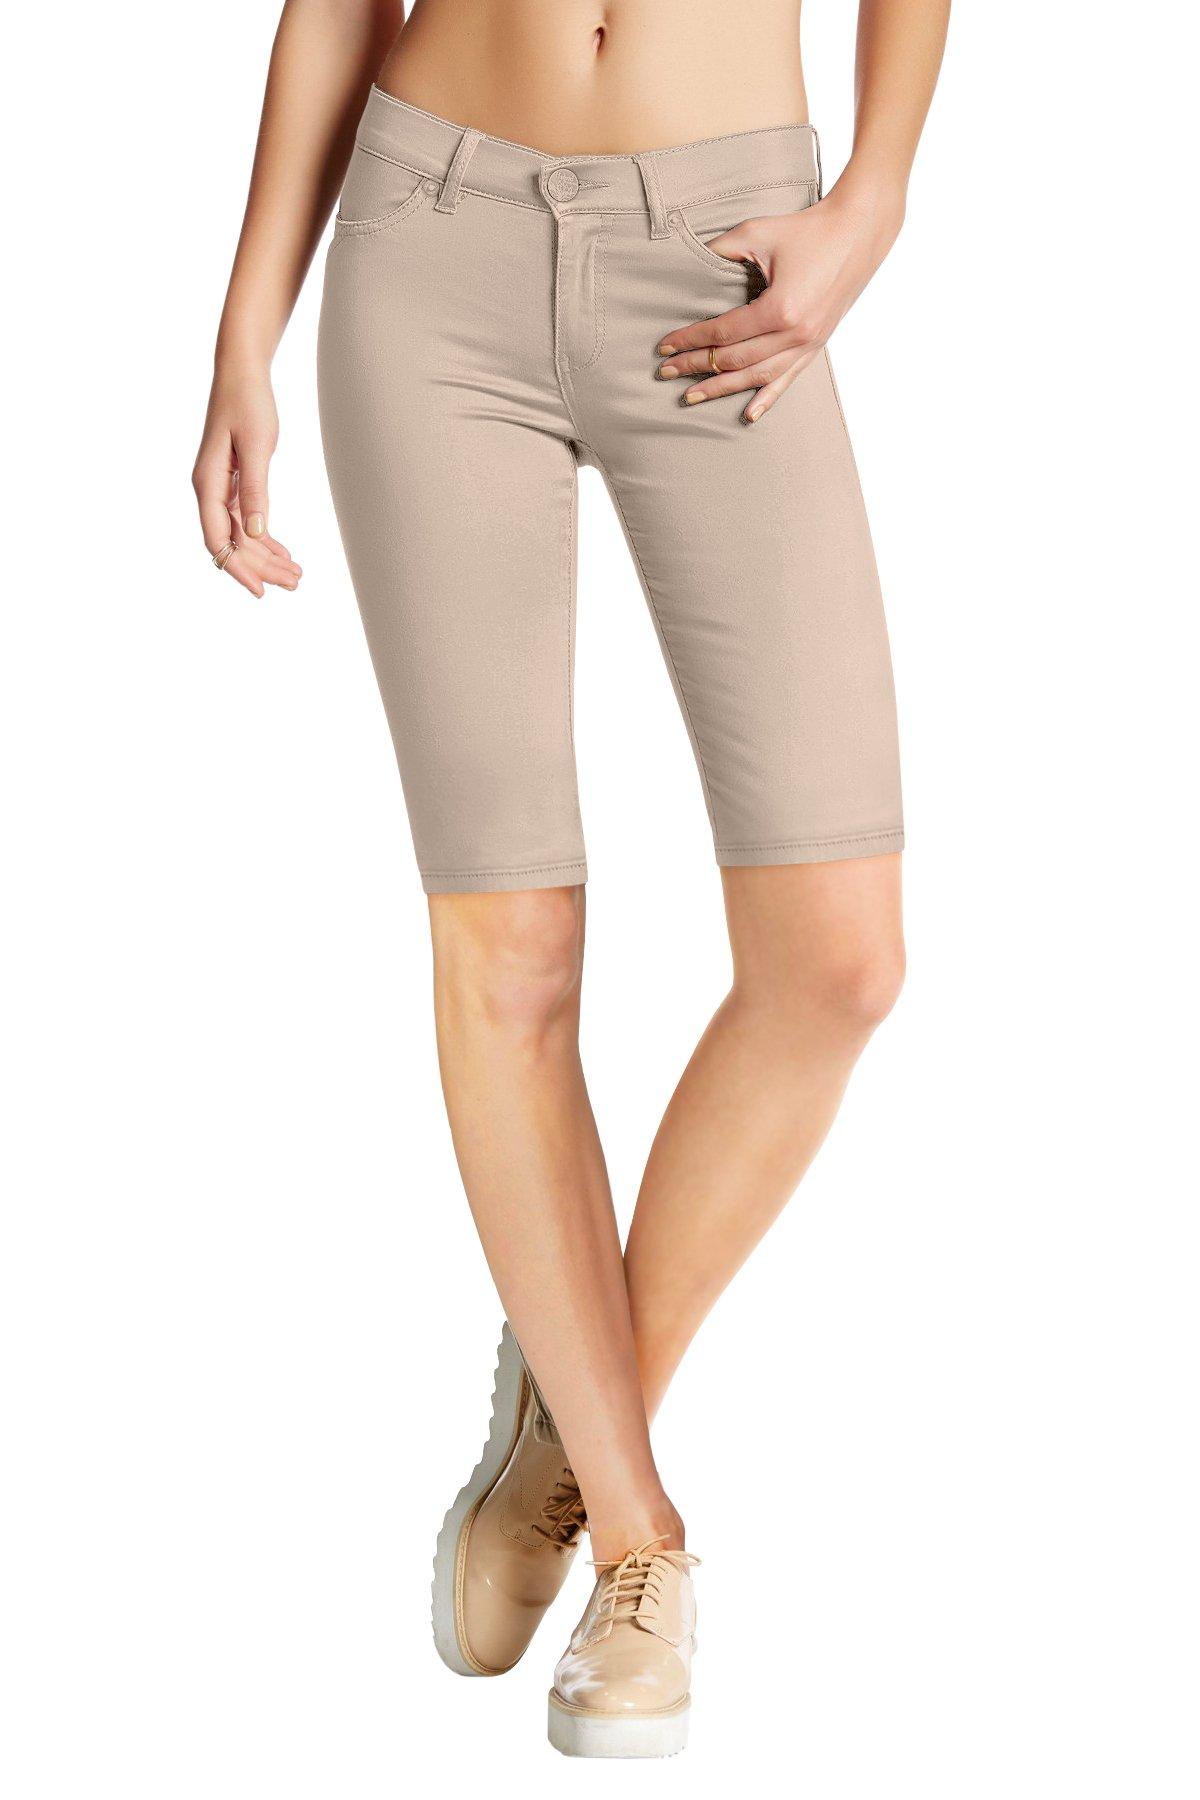 Womens Perfectly Shaping Hyper Stretch Bermuda Shorts B44876X Stone 1X